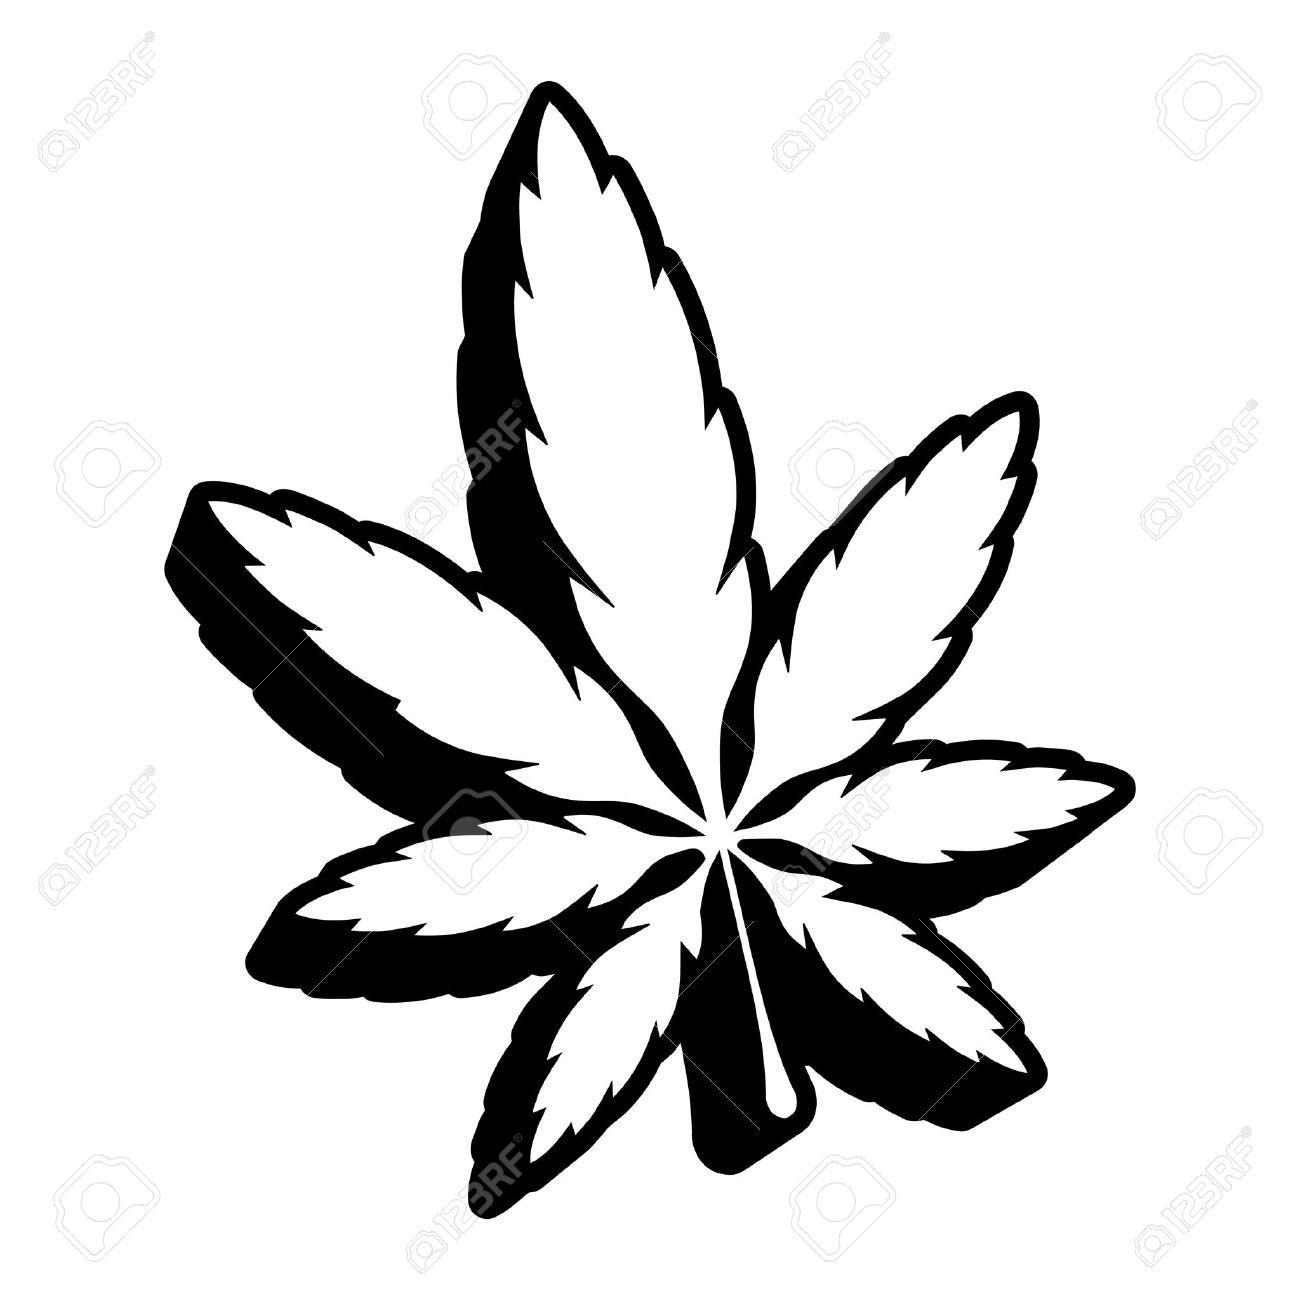 1300x1300 Marijuana Leaf Stock Photos. Royalty Free Business Images